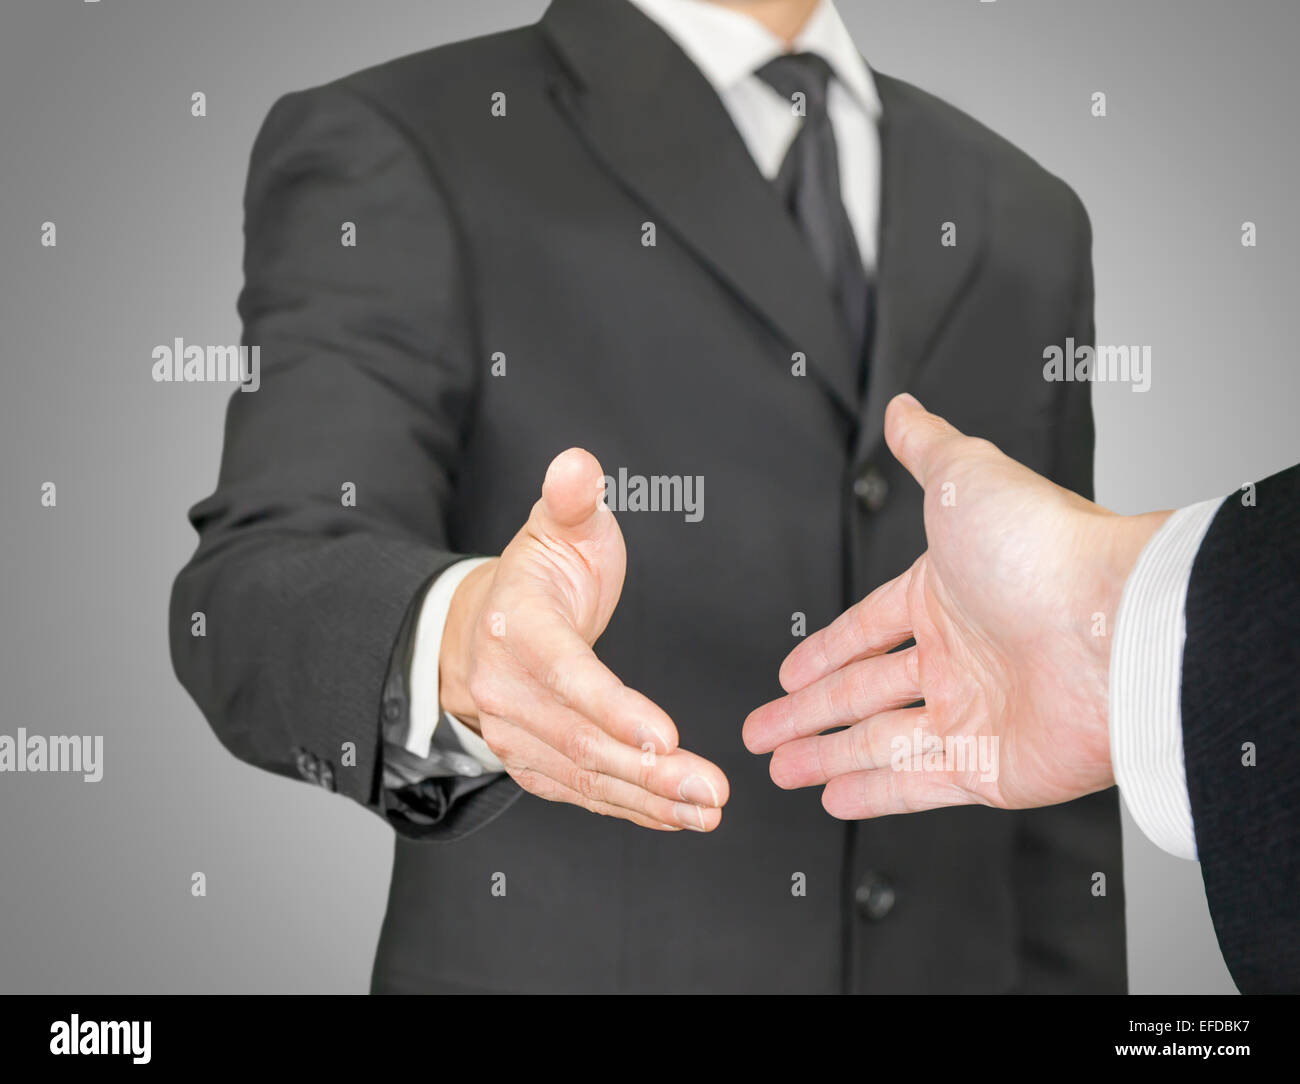 Apretón de manos de negocios, punto de vista composición Imagen De Stock